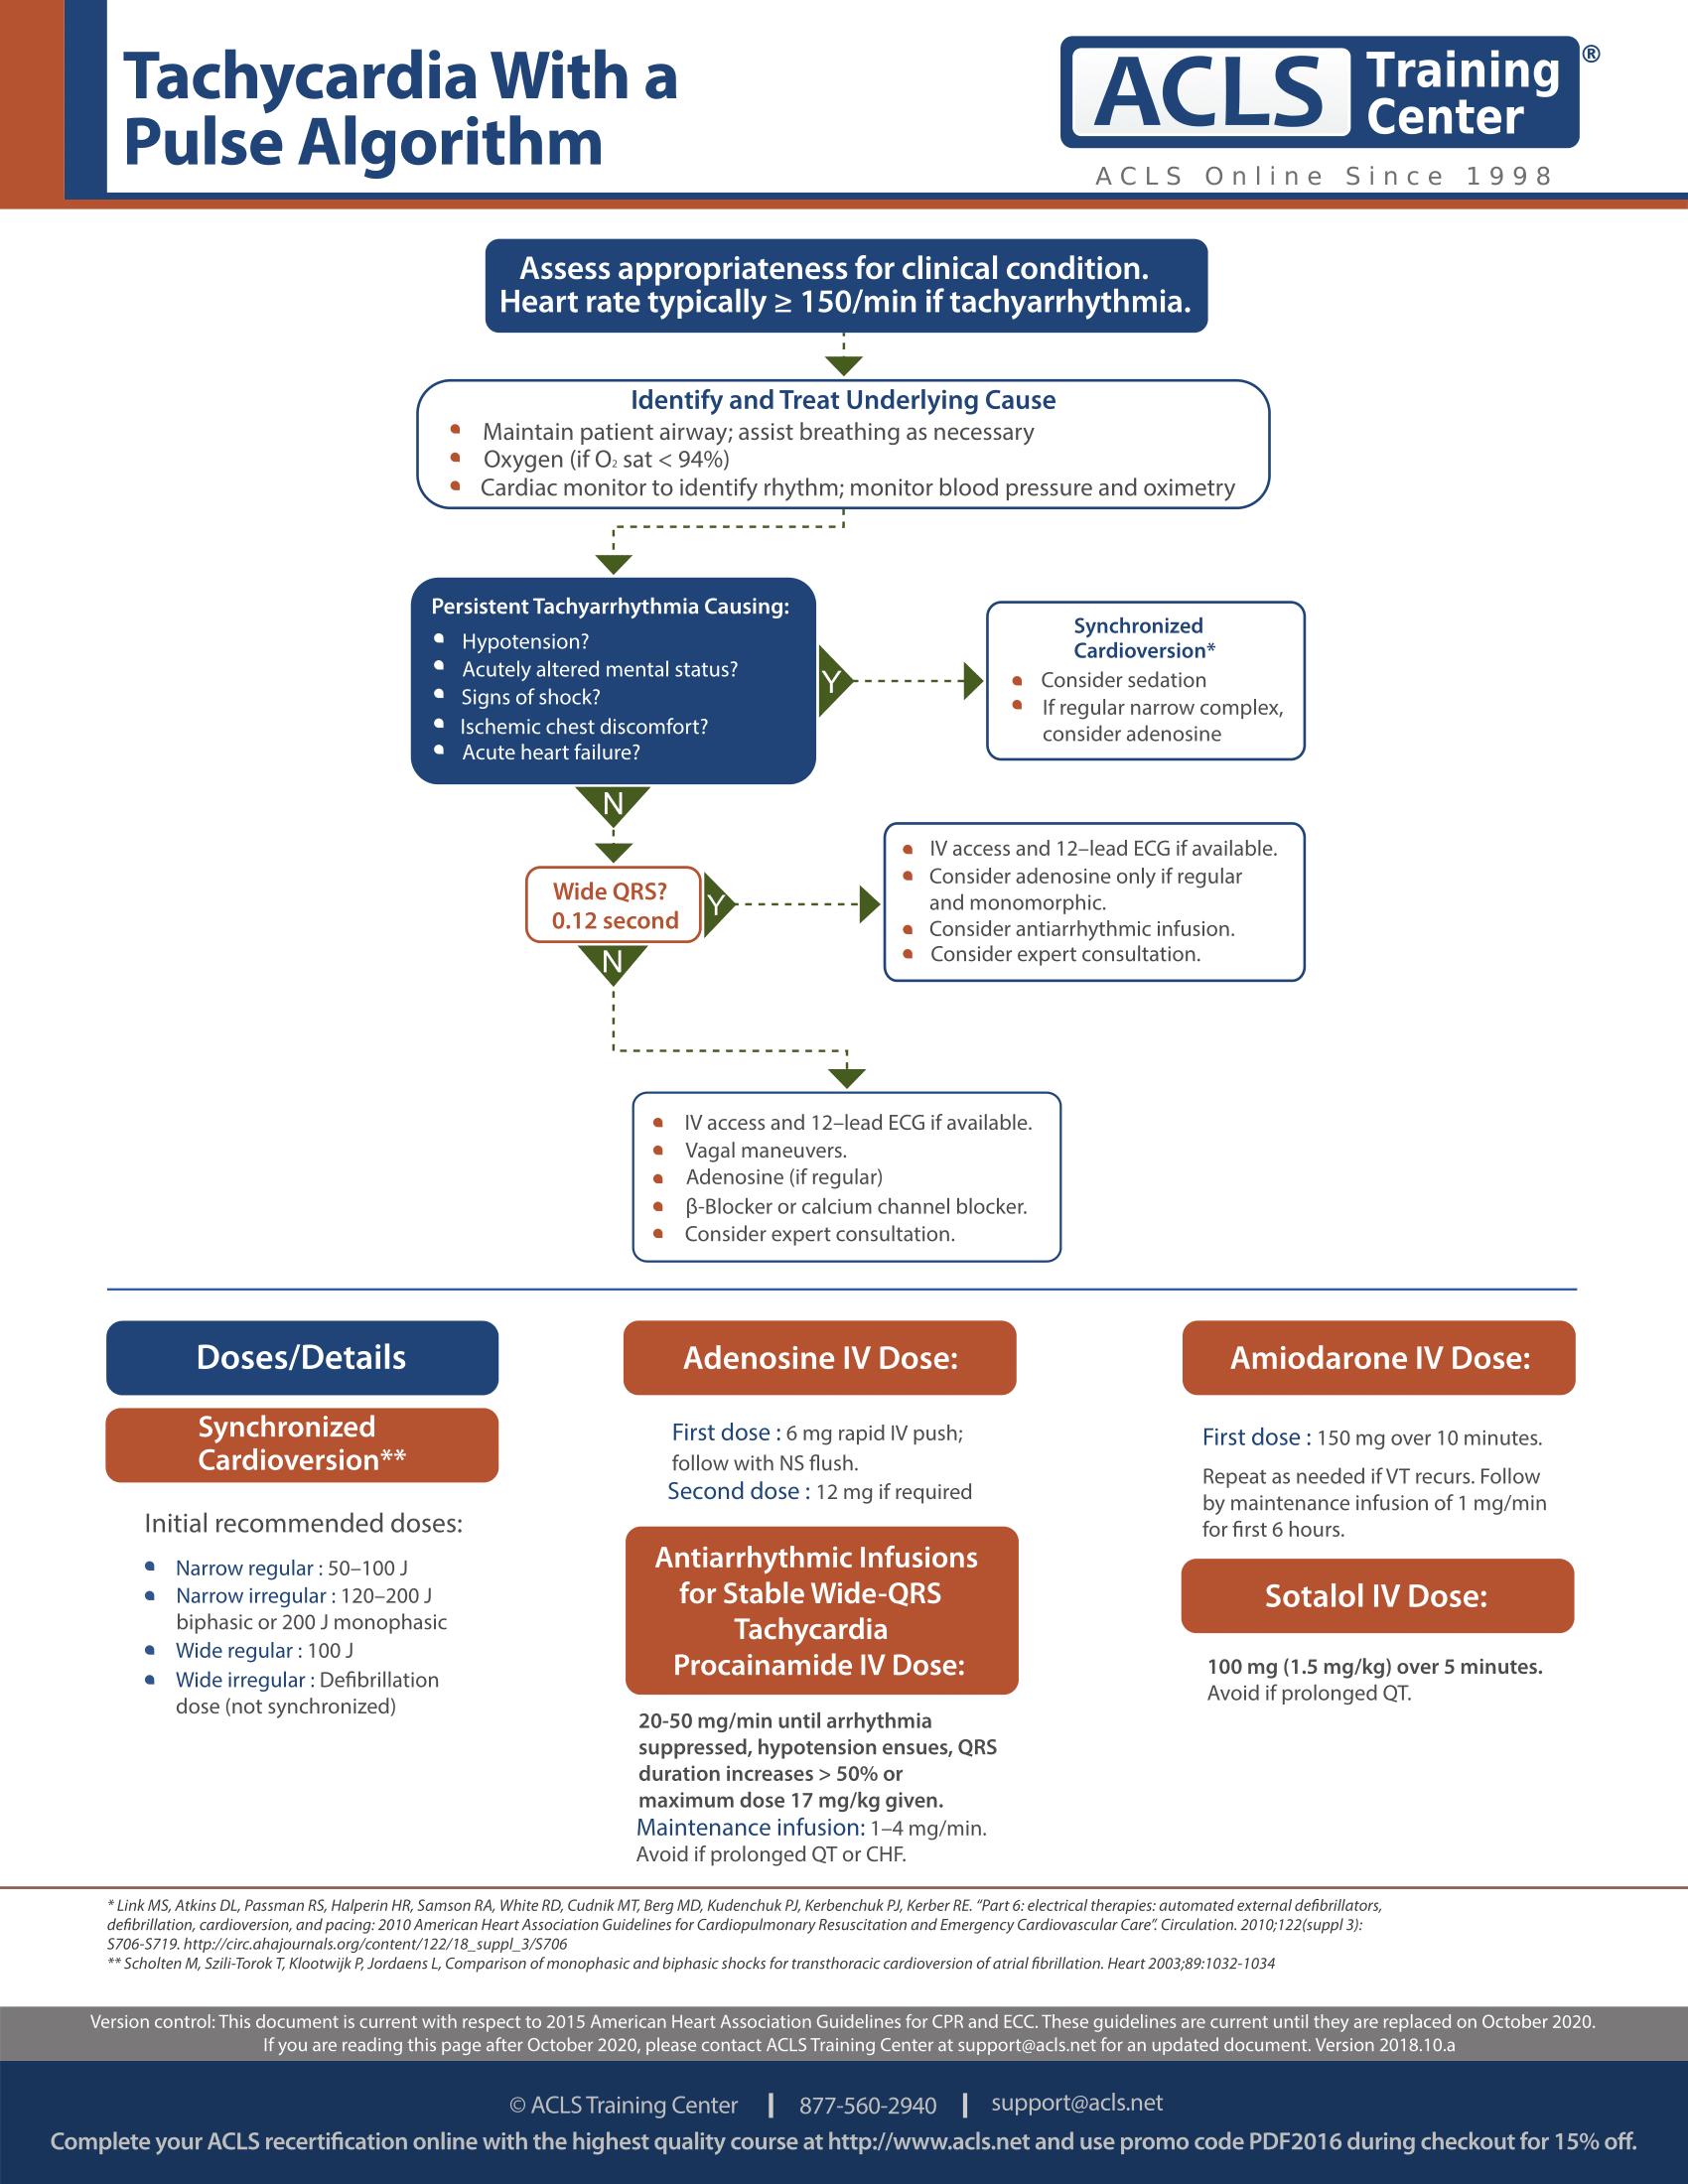 ACLS Tachycardia Algorithm for Managing Unstable ...